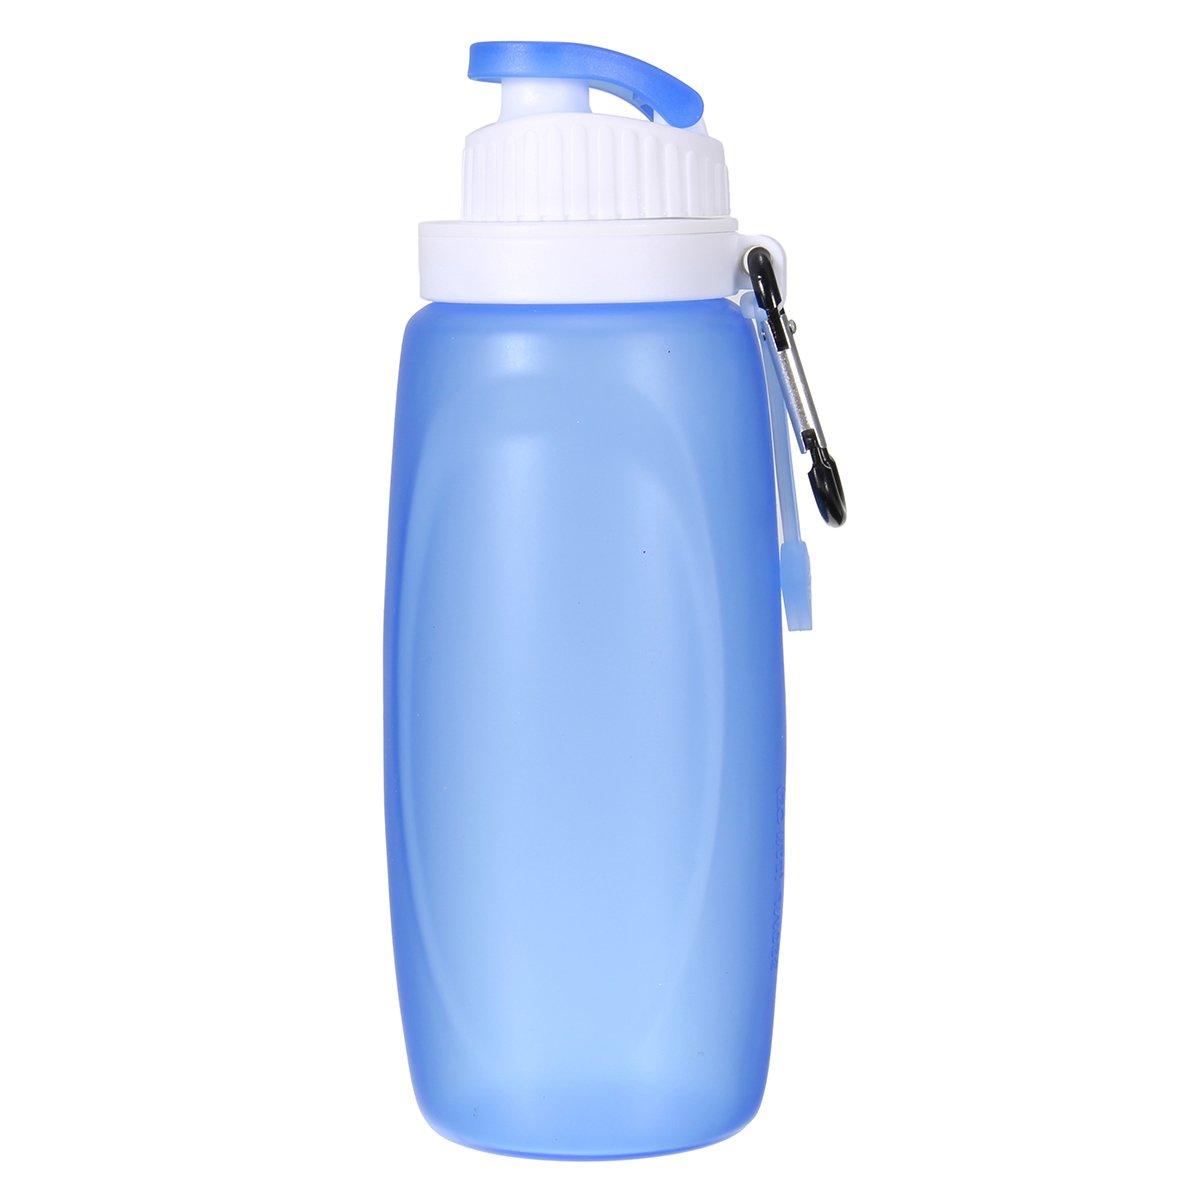 ShopSquare64 - Botella de Agua Plegable de Silicona para para Silicona Deportes al Aire Libre, Viajes, Senderismo (320 ML) 0aada4